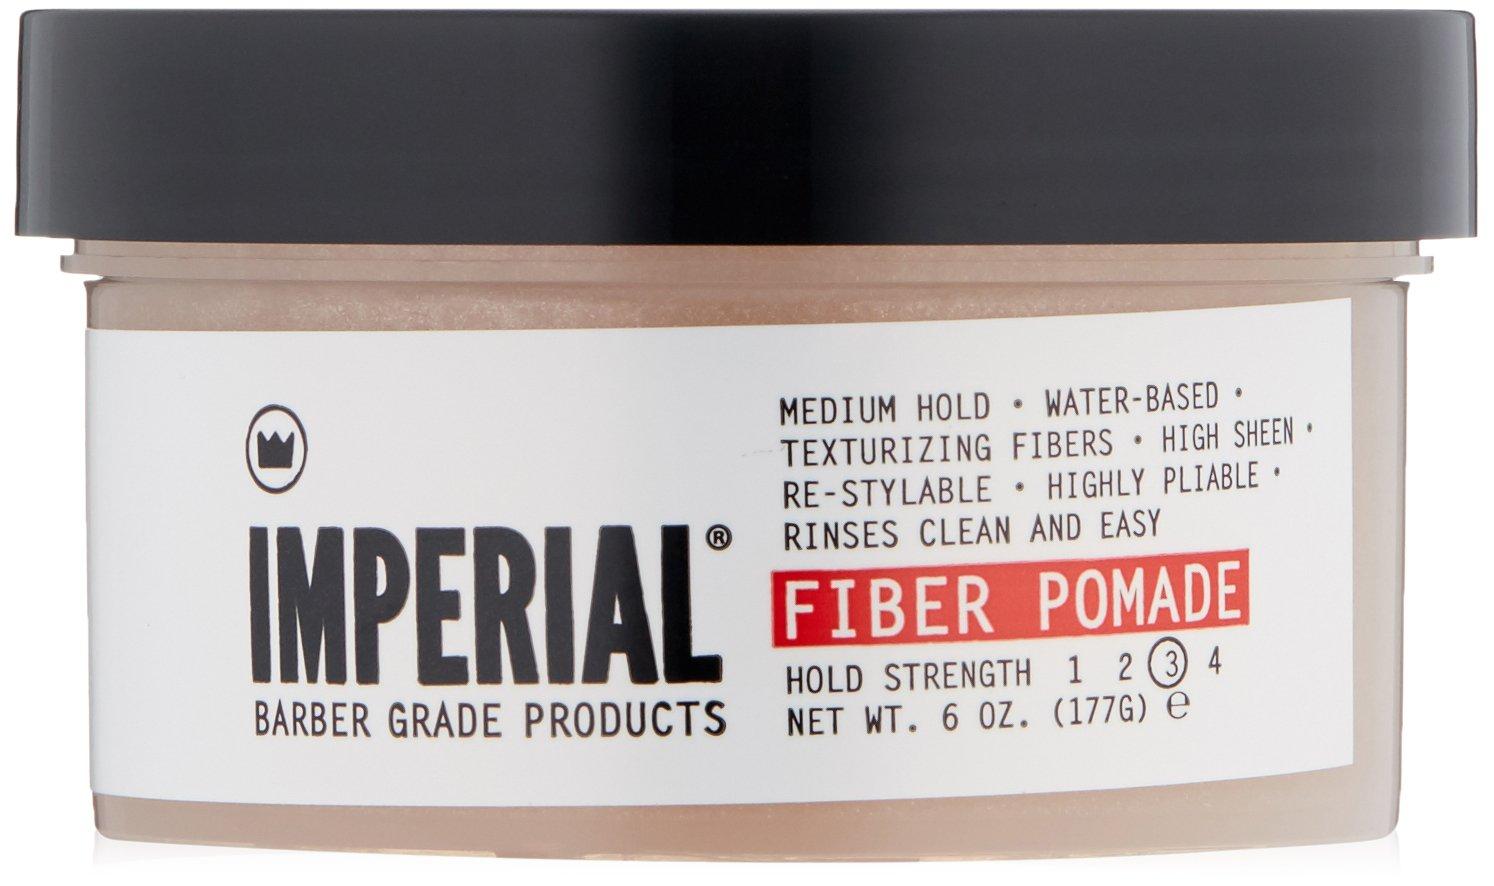 Imperial Barber Grade Products Fiber Pomade 6 0z.